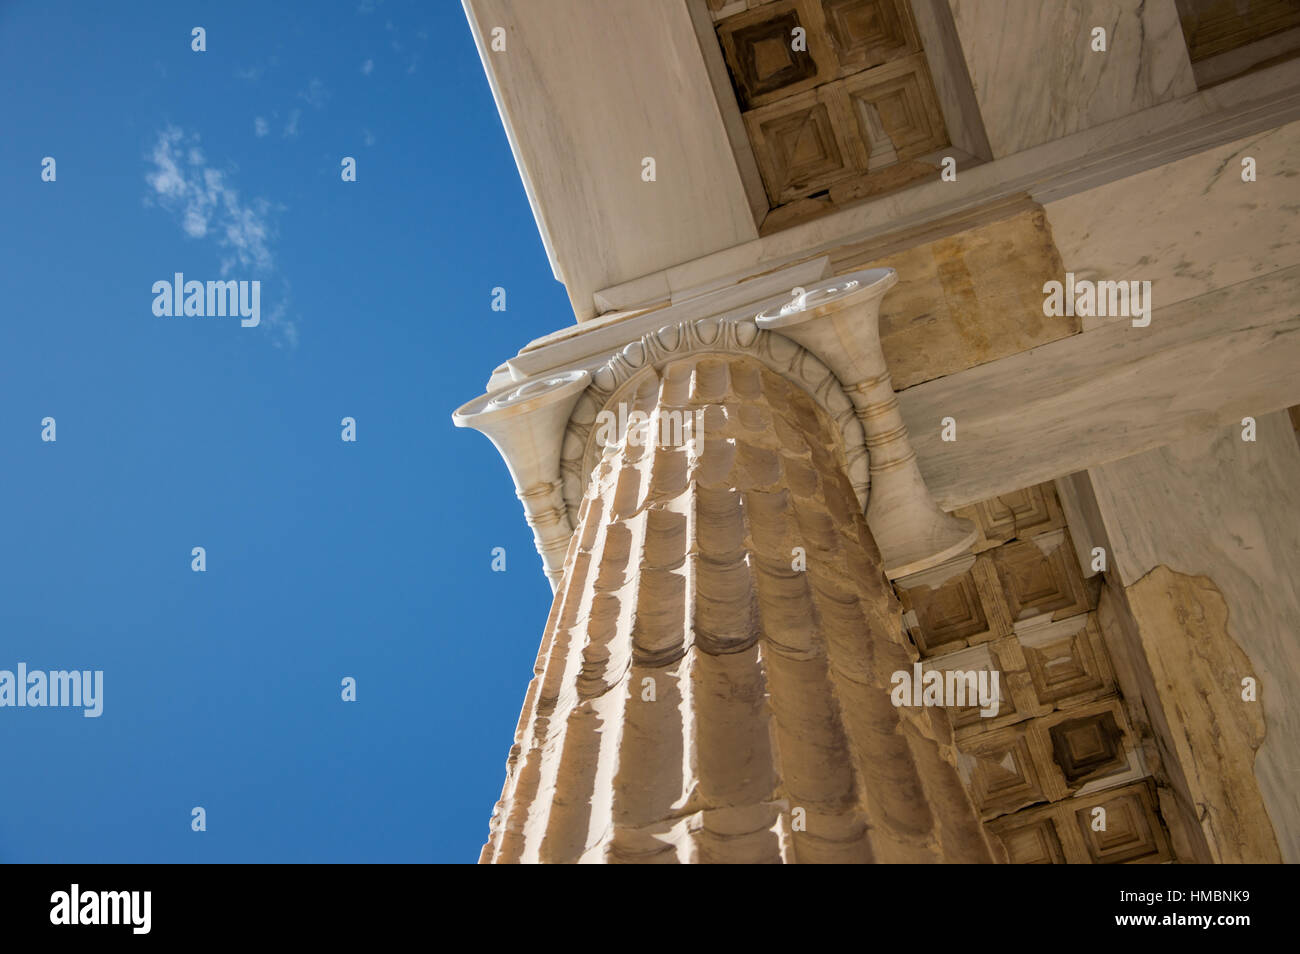 Propylaea Acropolis Athens Greece - Stock Image